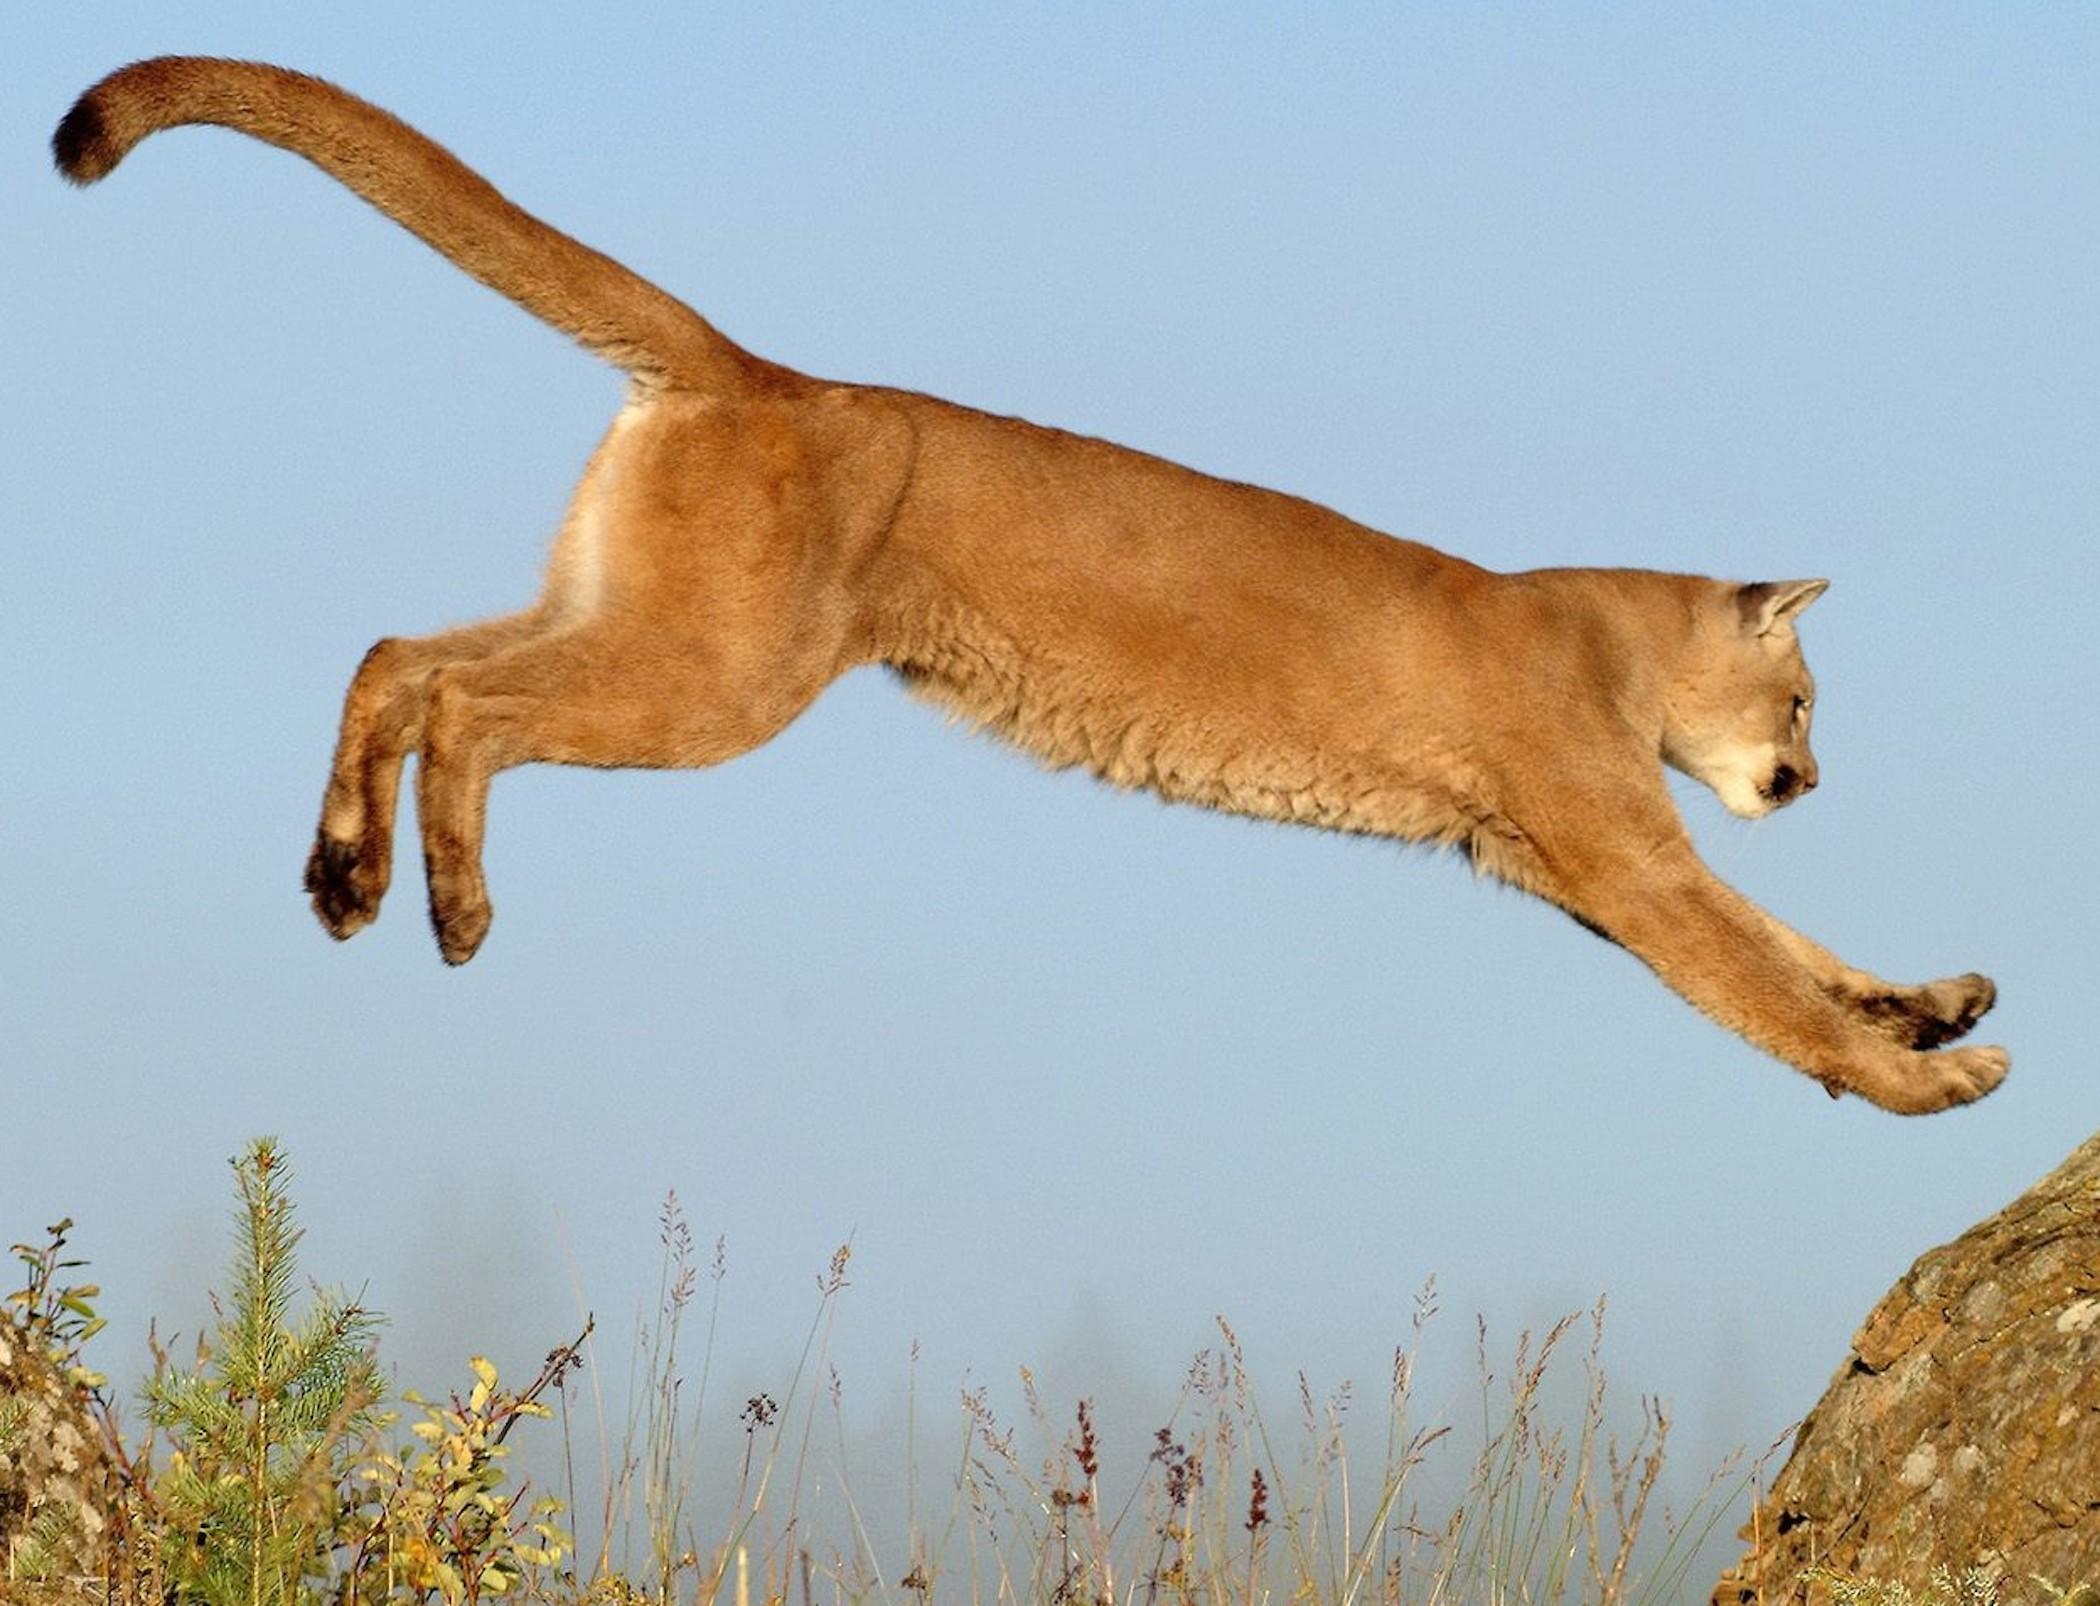 3d Mirror Wallpaper Leaping Cougar Wallpaper Free Hd Big Cat Backgrounds